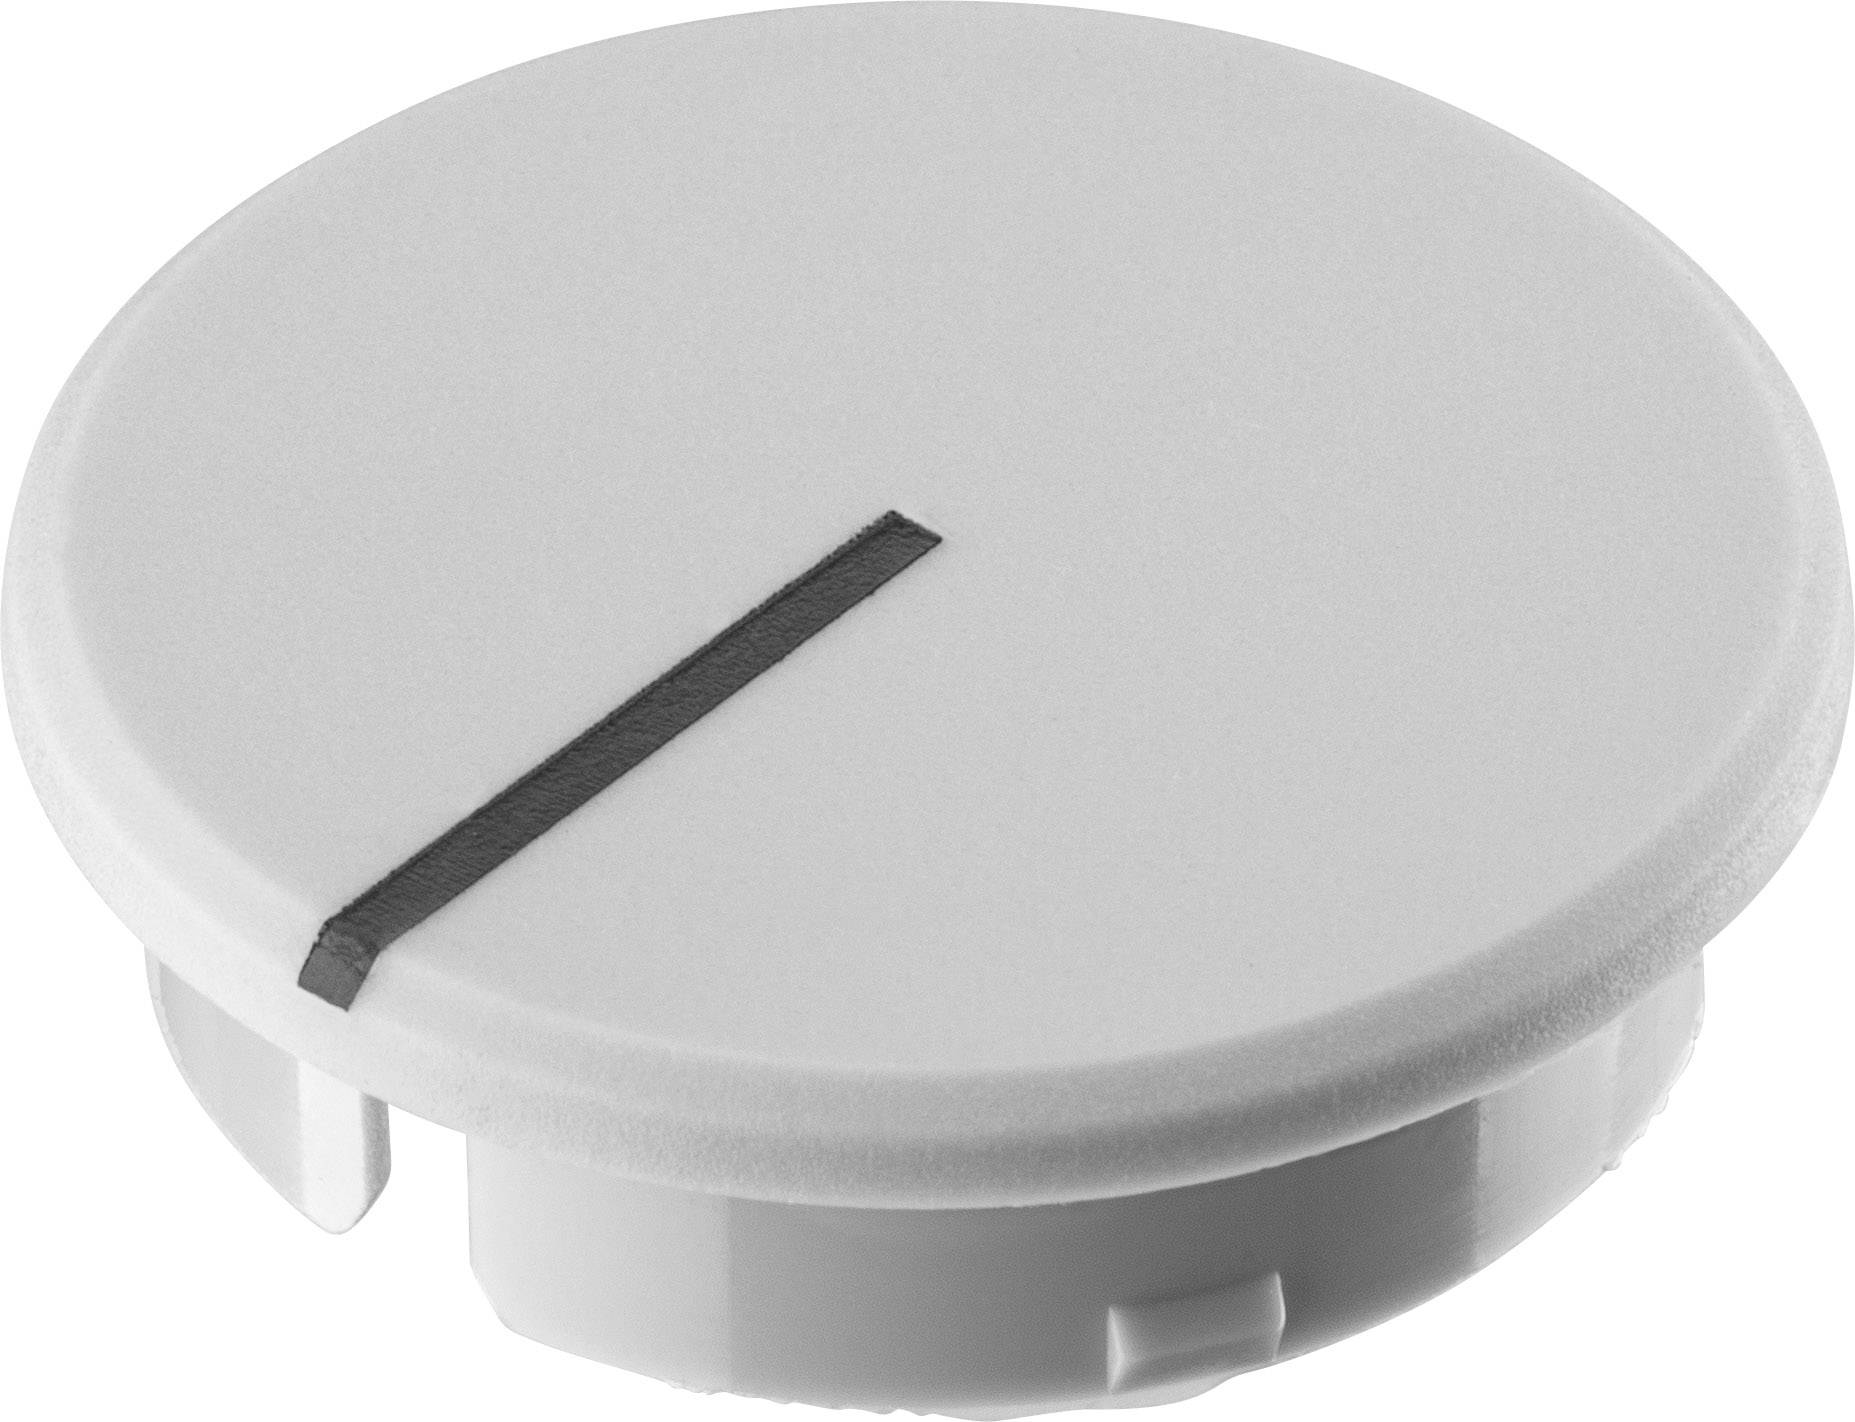 Krytka knoflíku s ukazatelem Ritel 30 28 11 1 21.6 mm, šedá, 1 ks